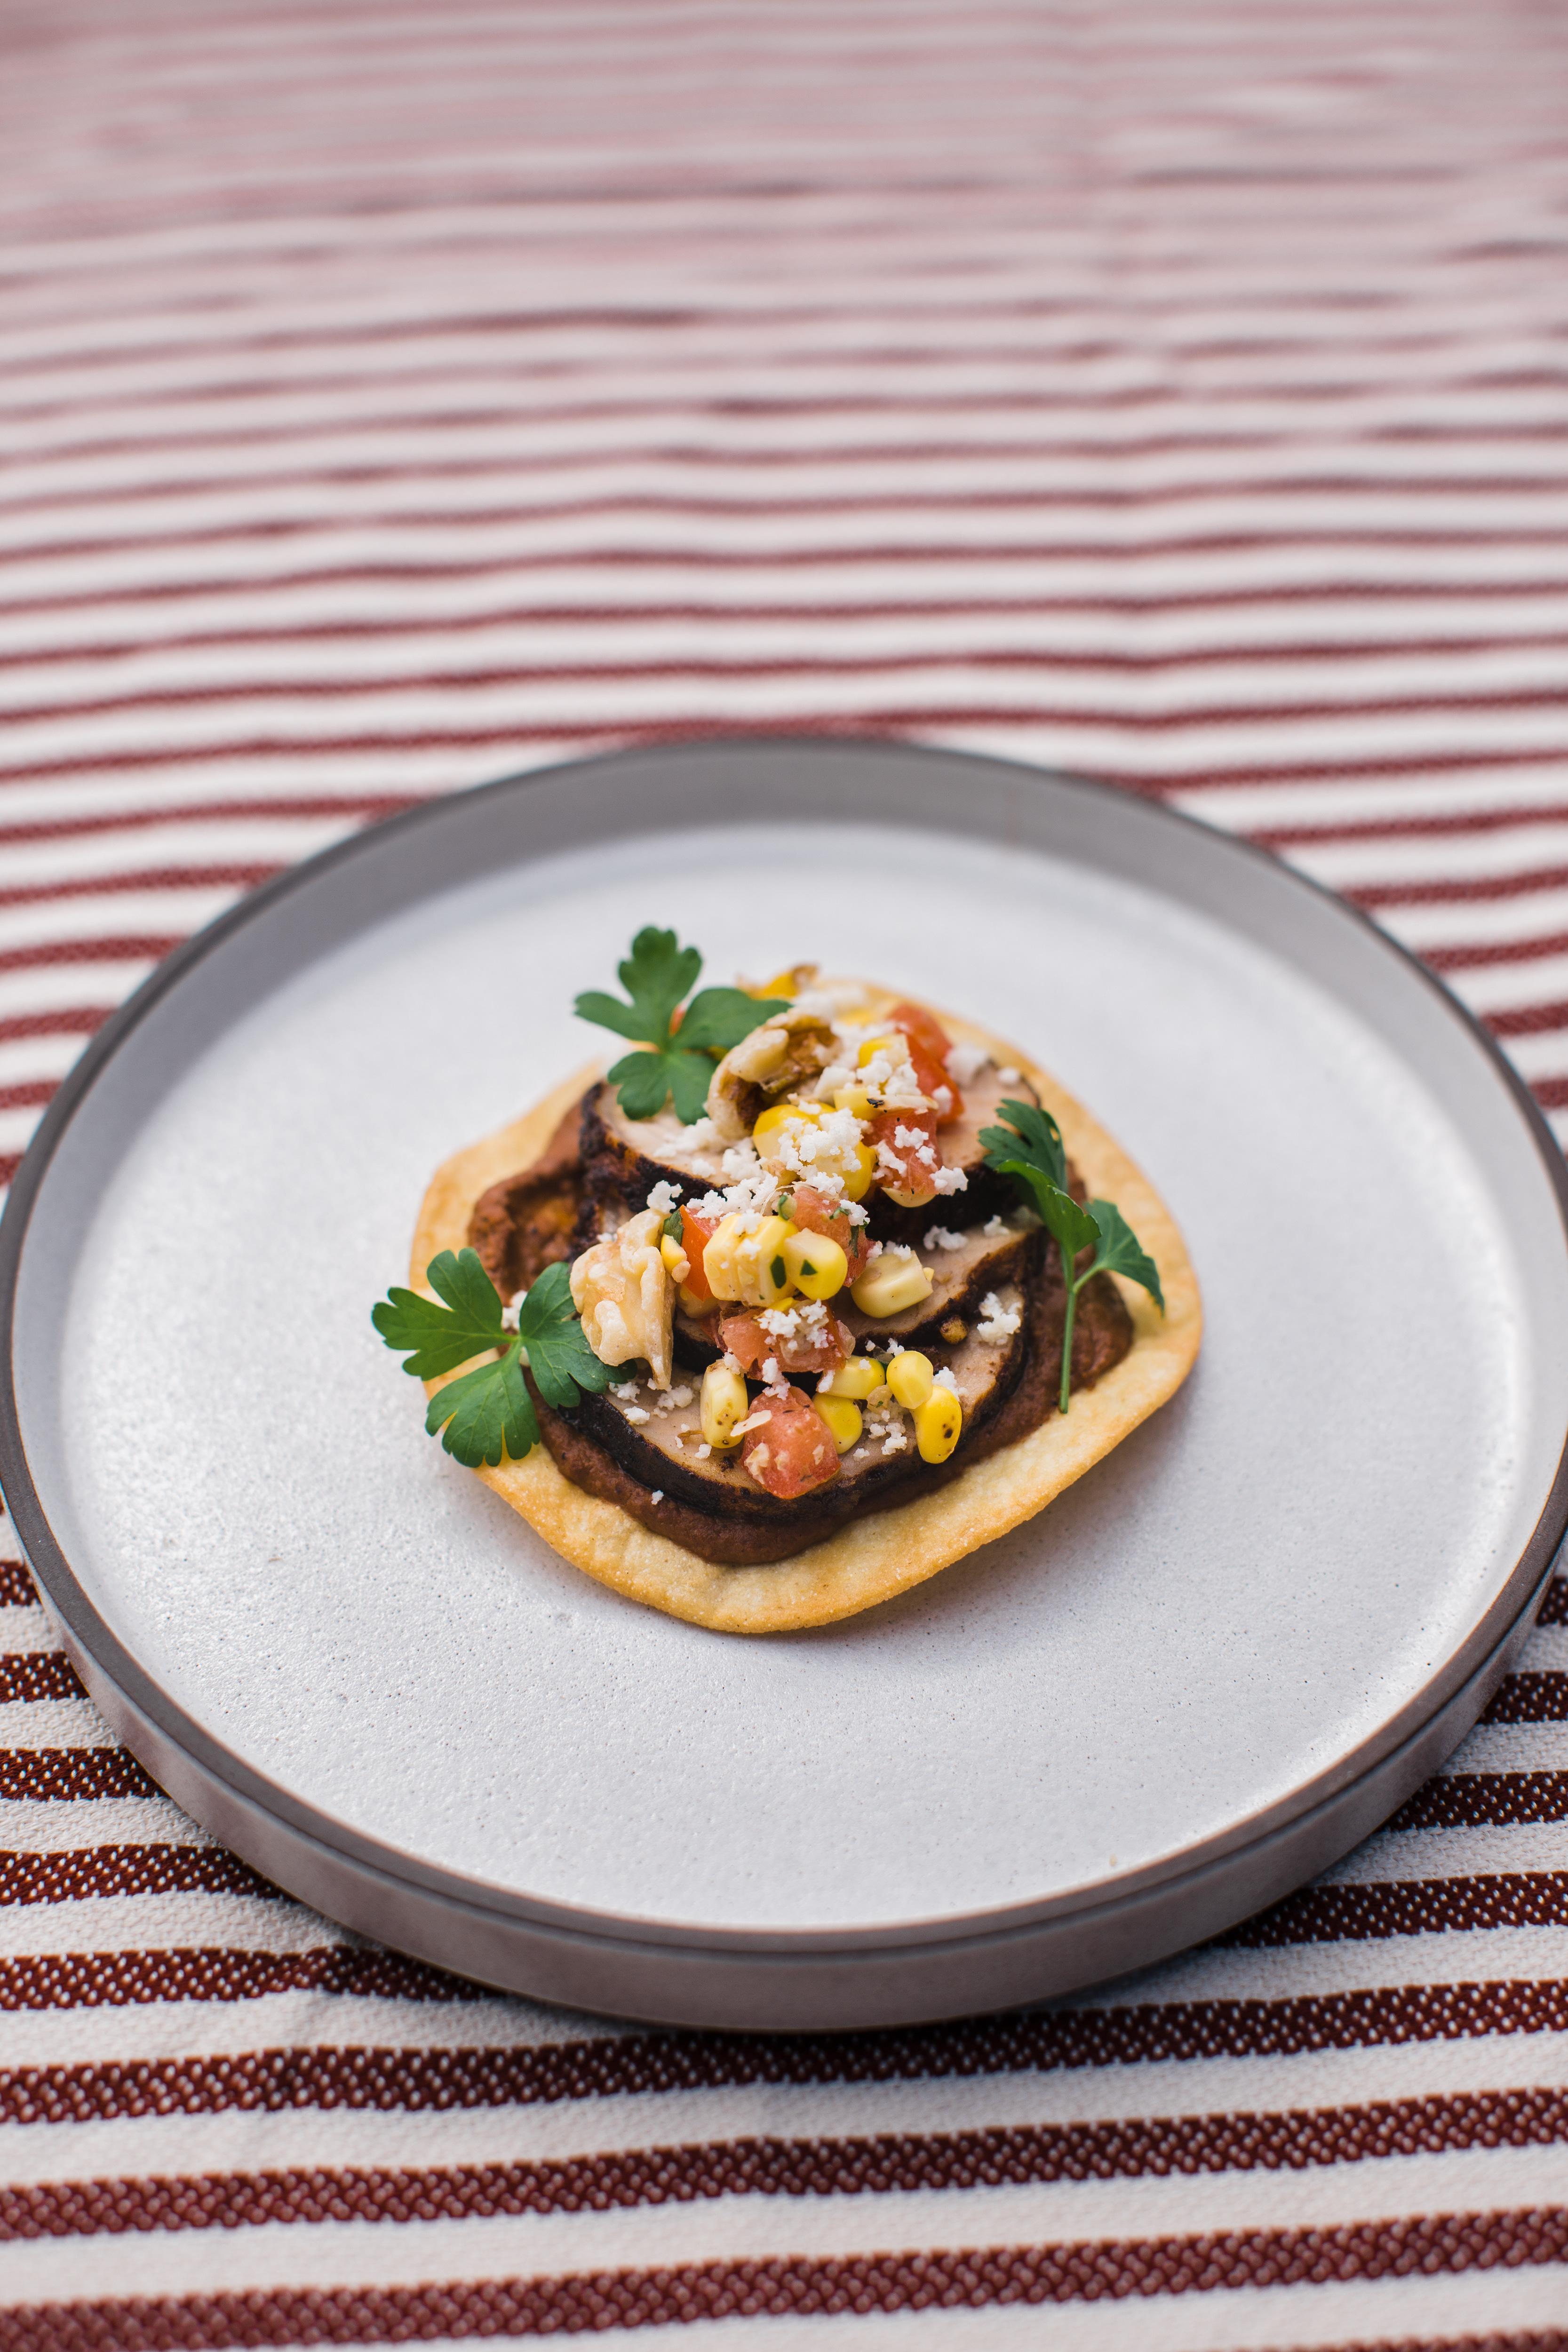 Walnut Chocolate Mole Tacos